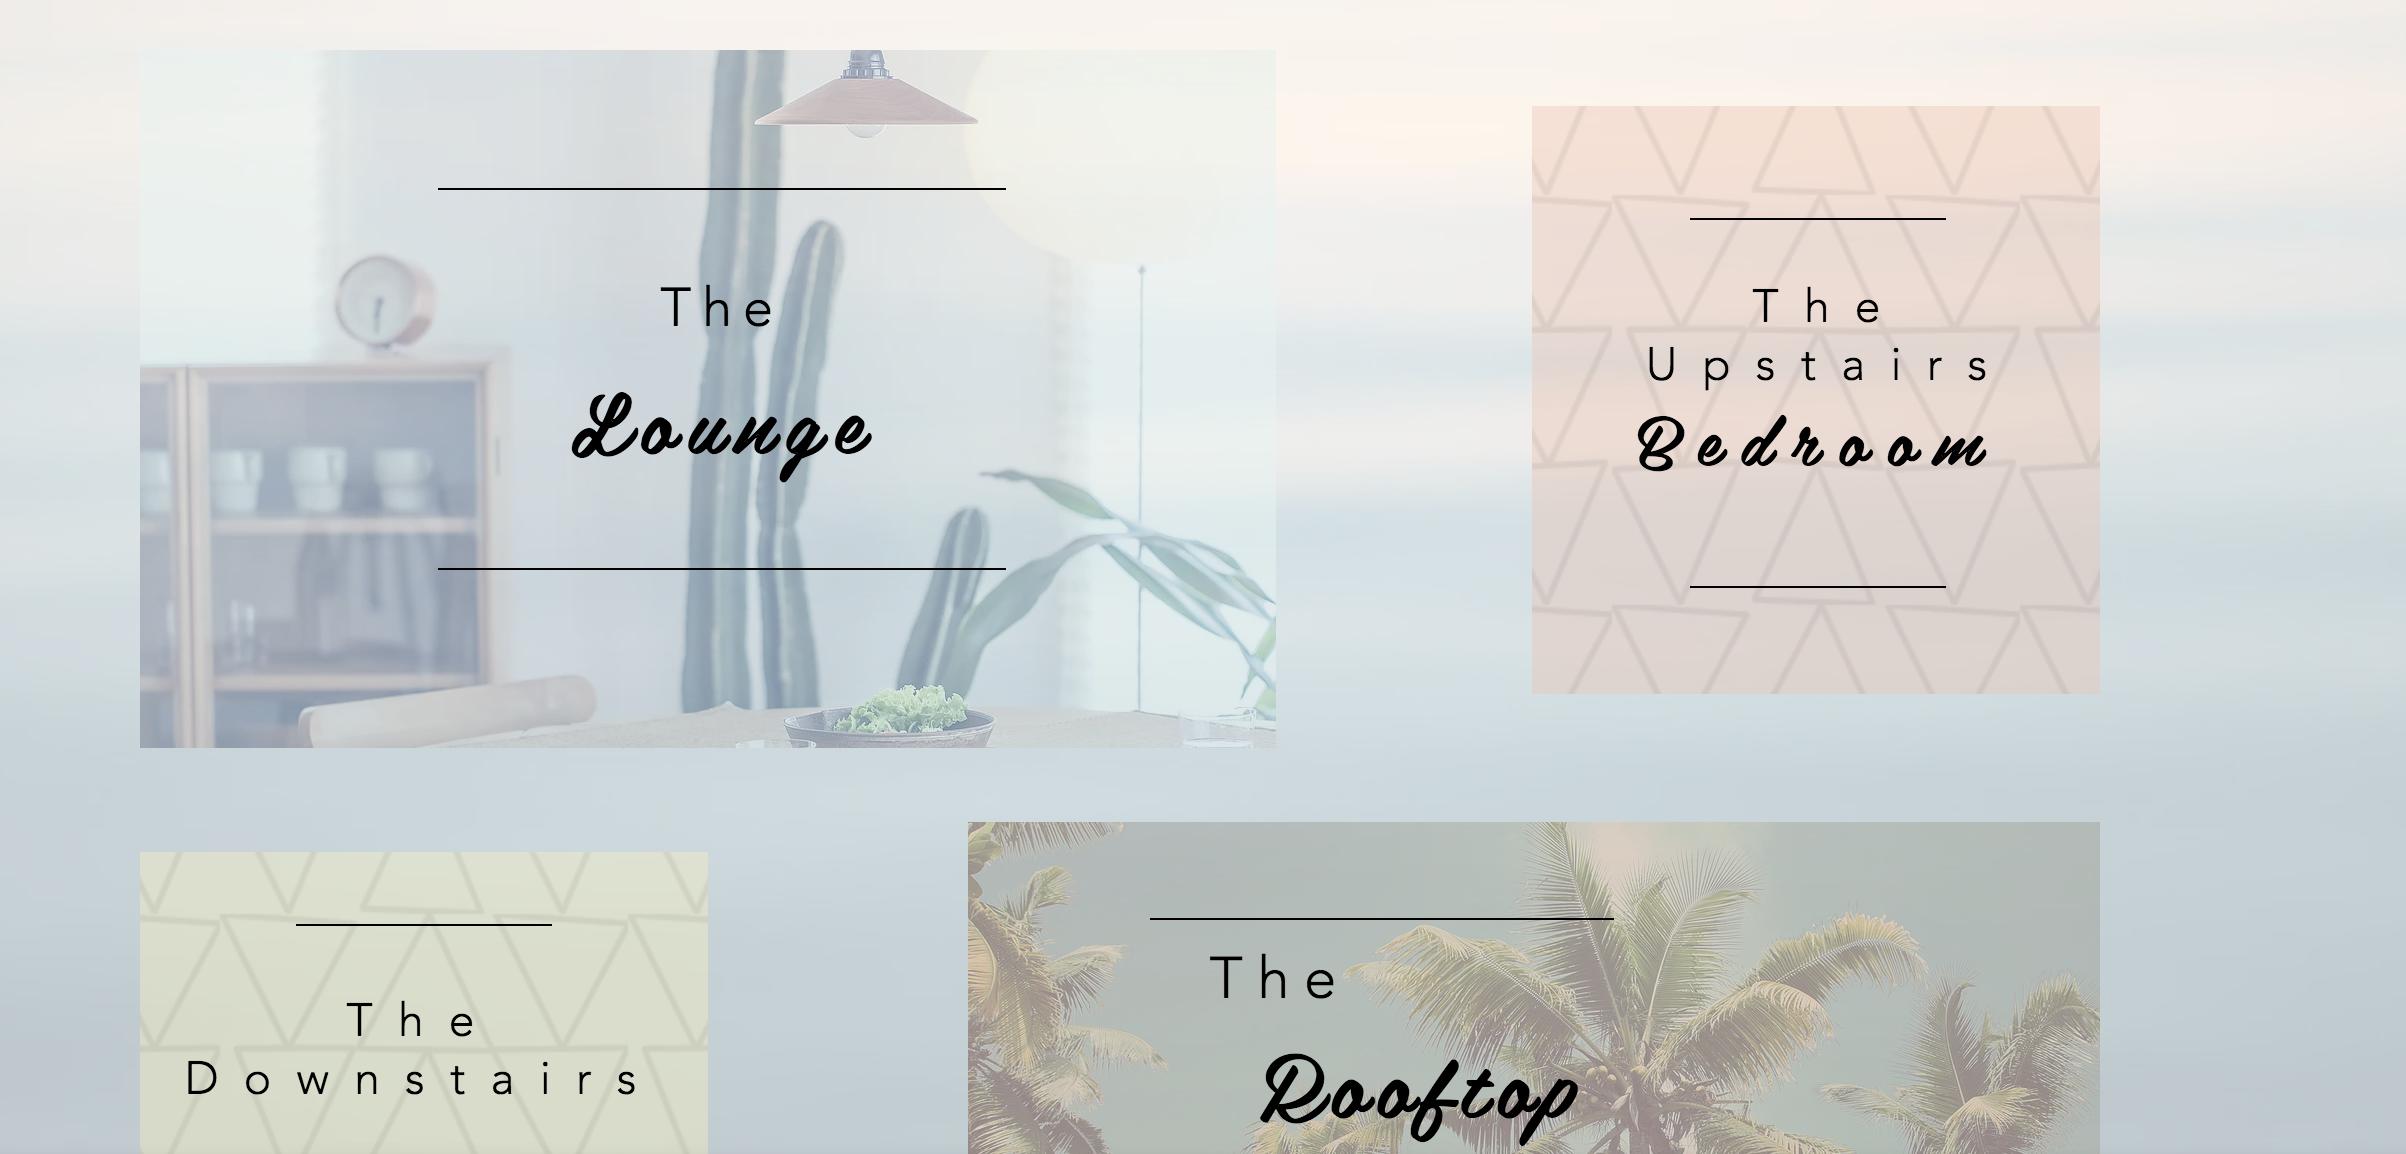 CASA SAN PEDRITO - Website Design